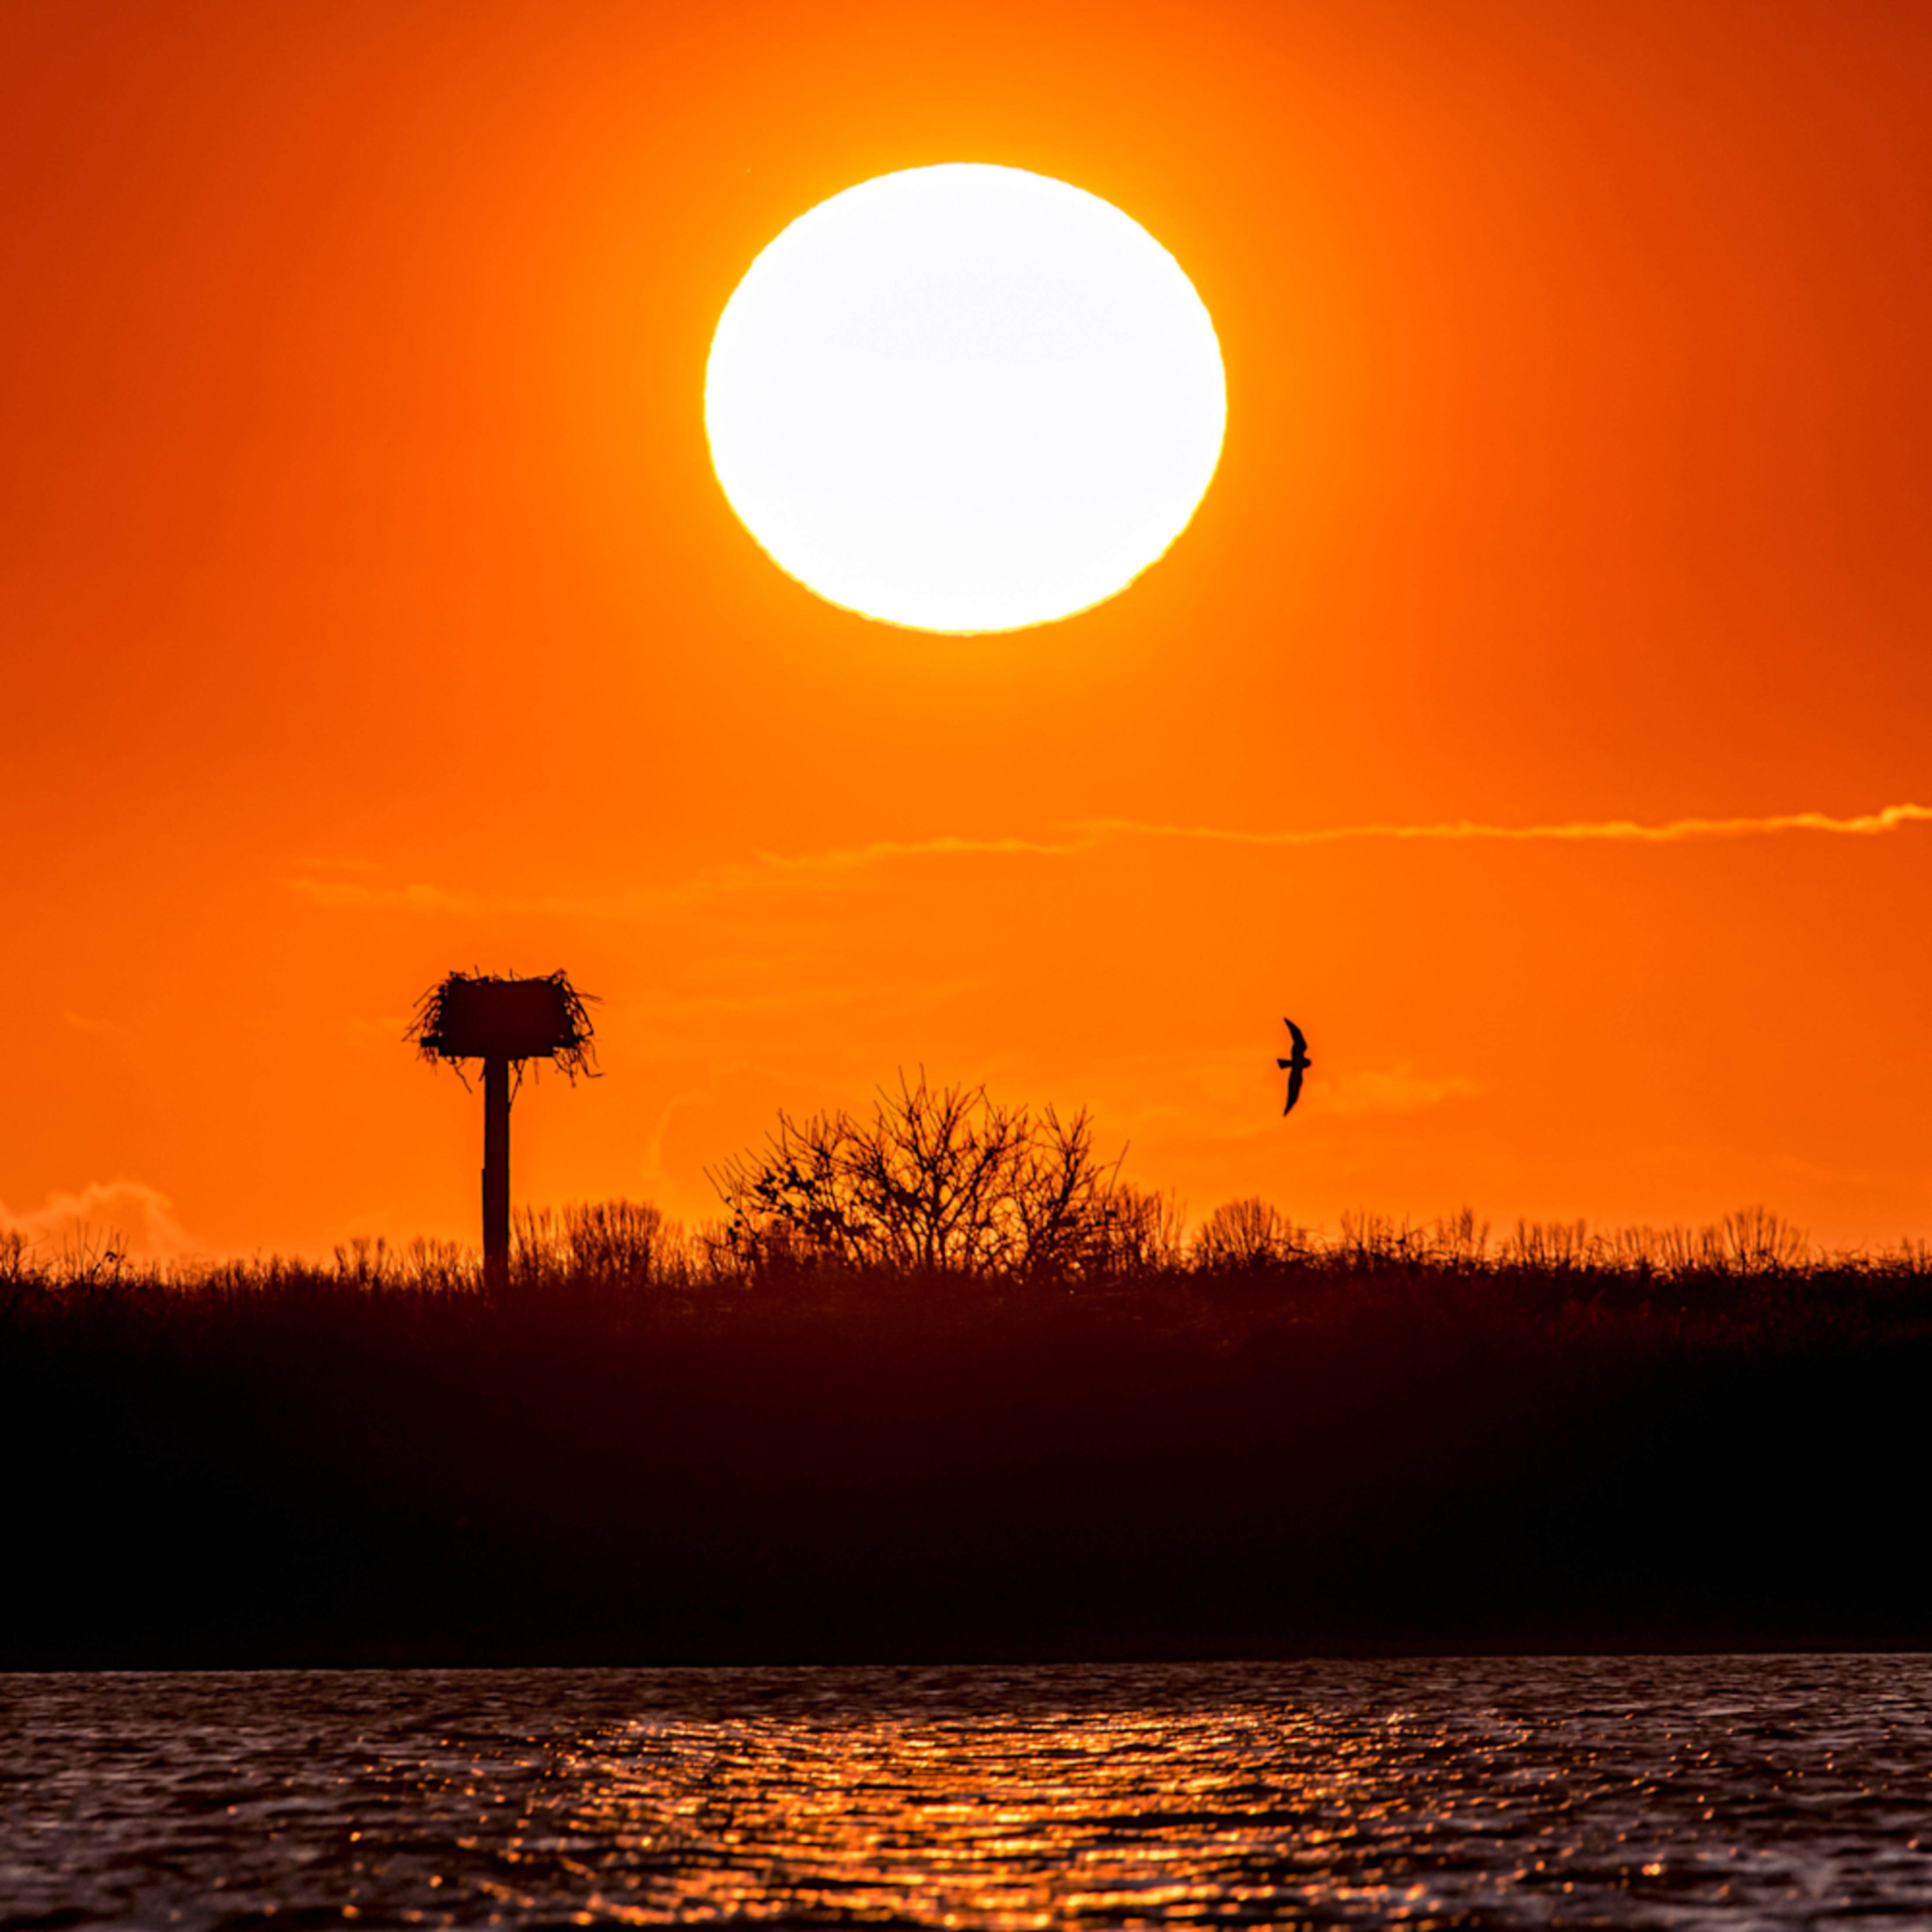 Chappy cape poge osprey setting sun nsxgjl